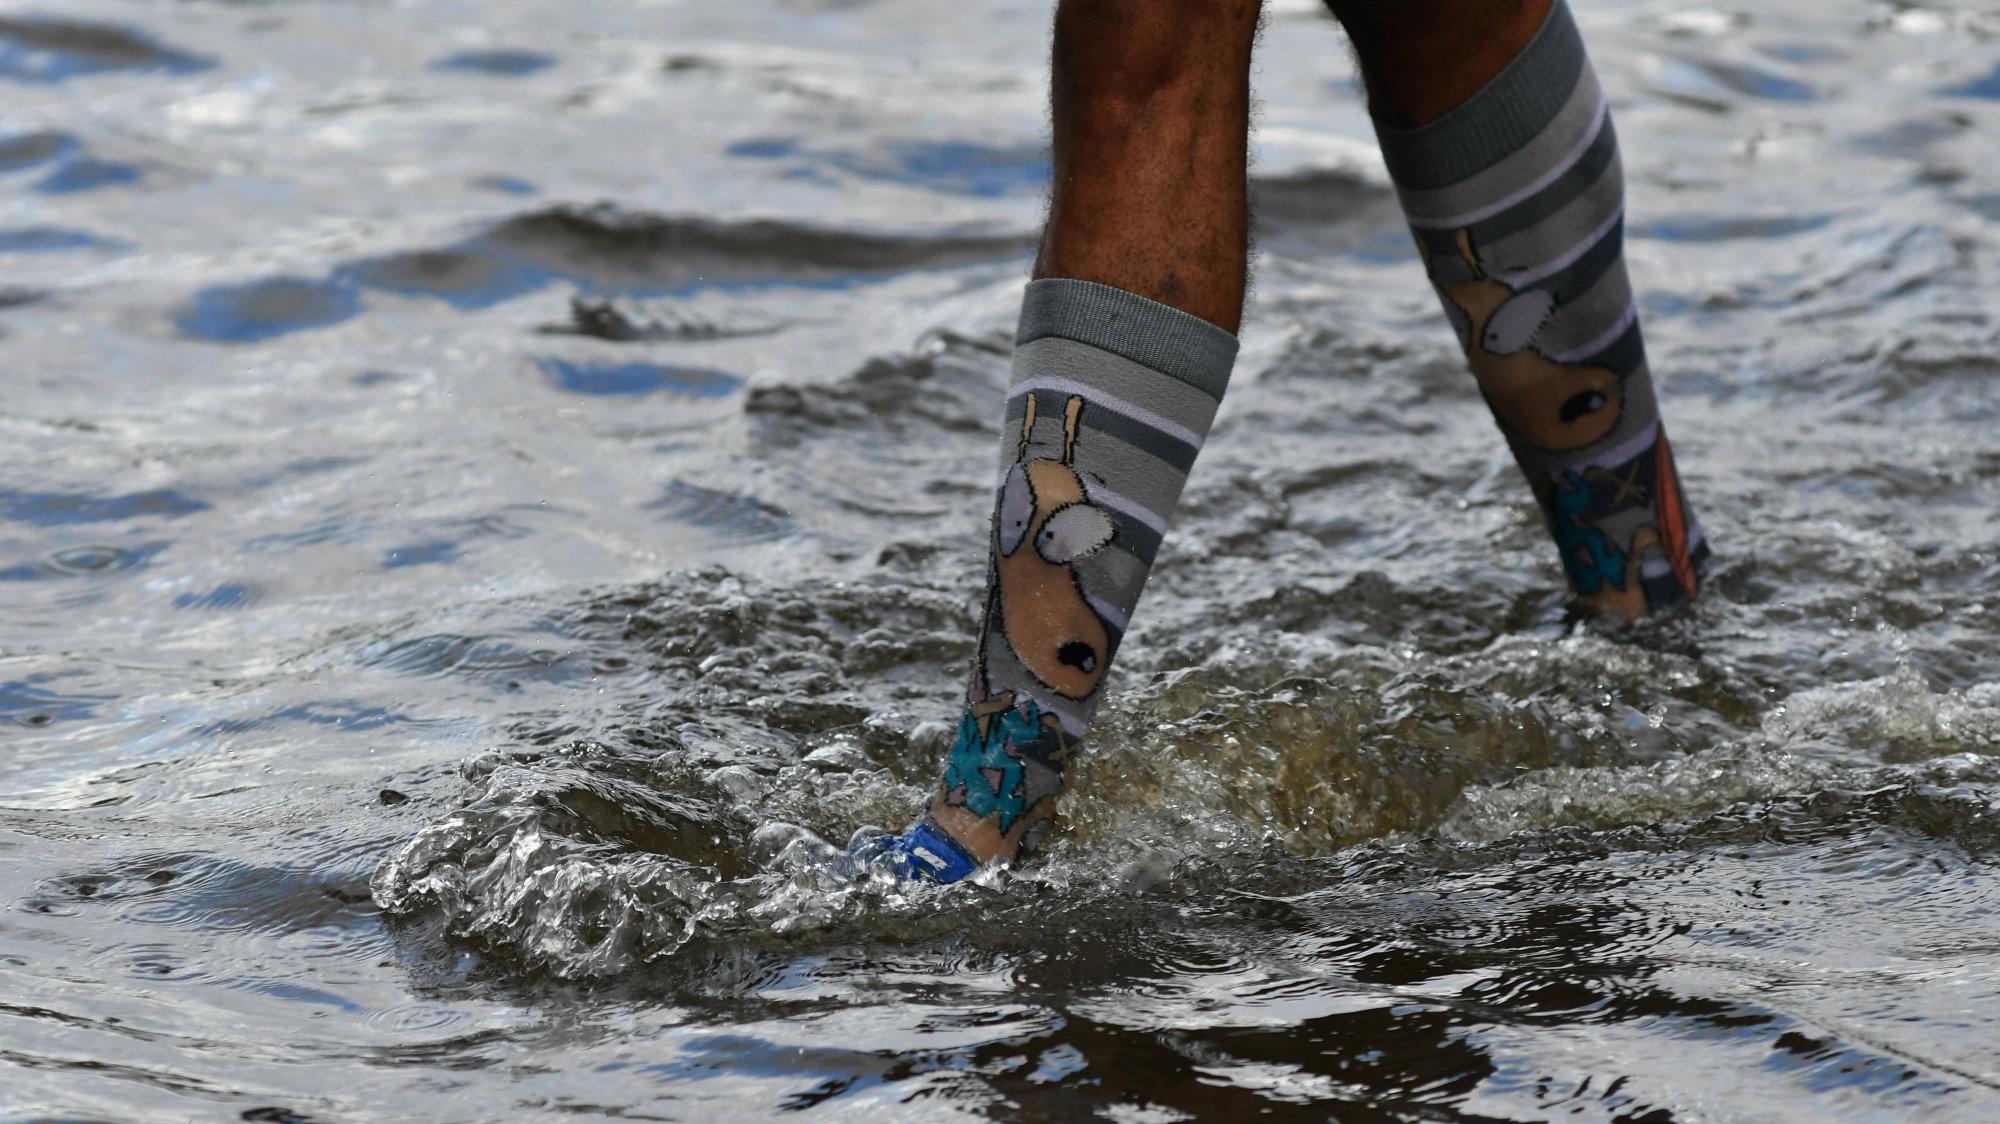 aldo shoes jacksonville fl flooding newspaper articles